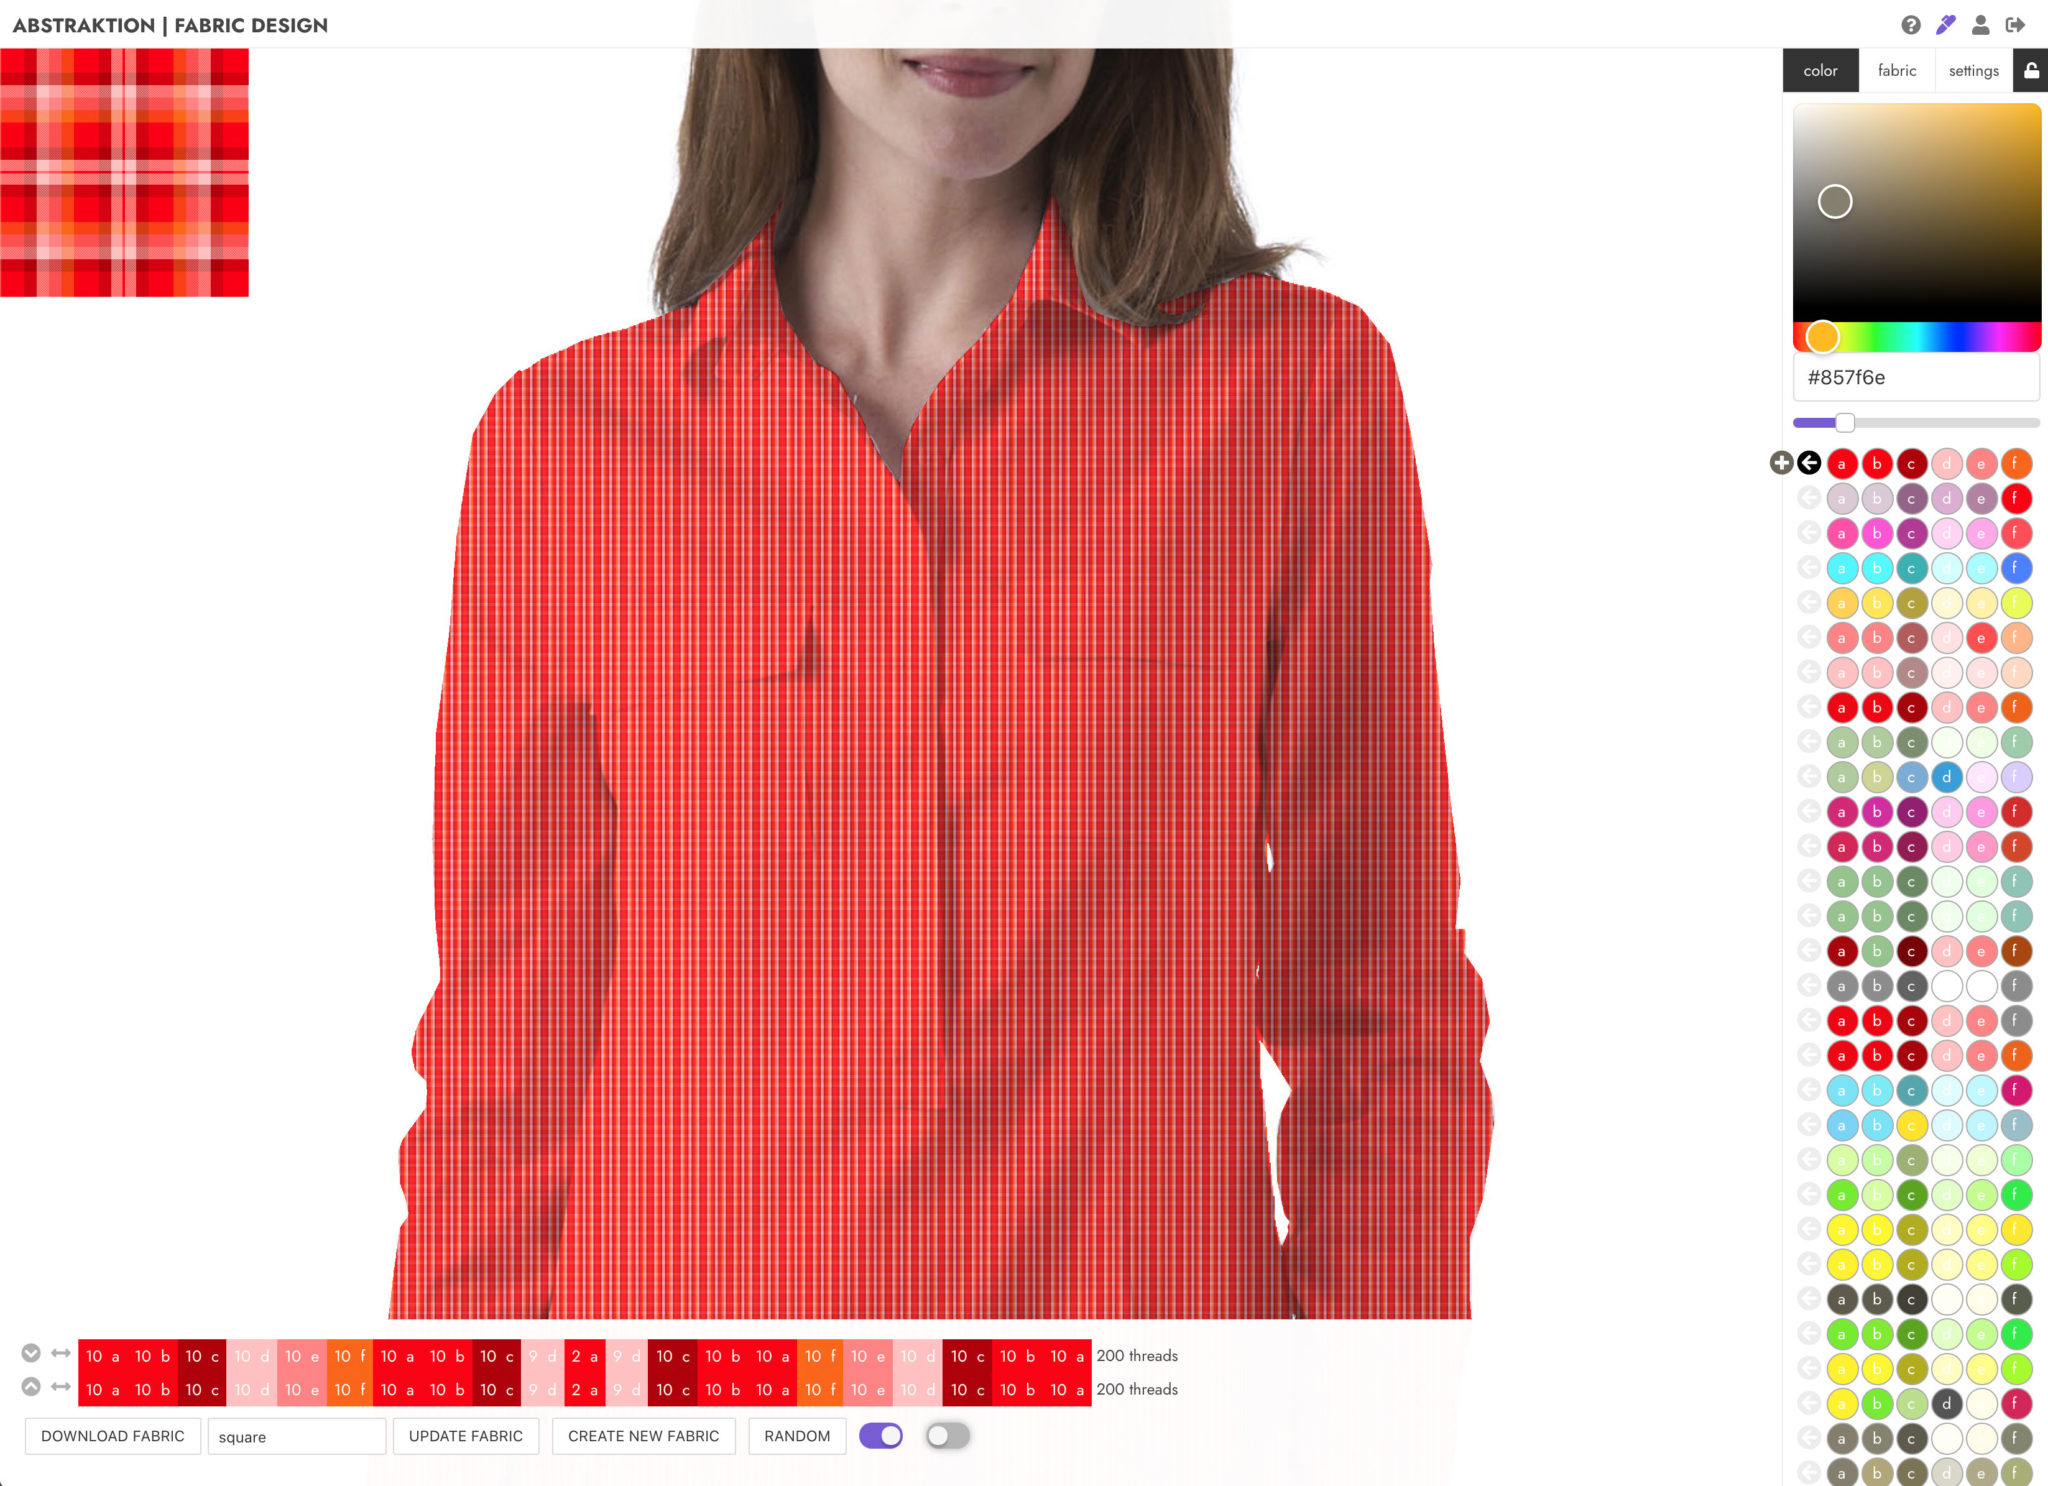 abstraktion saas fabric software